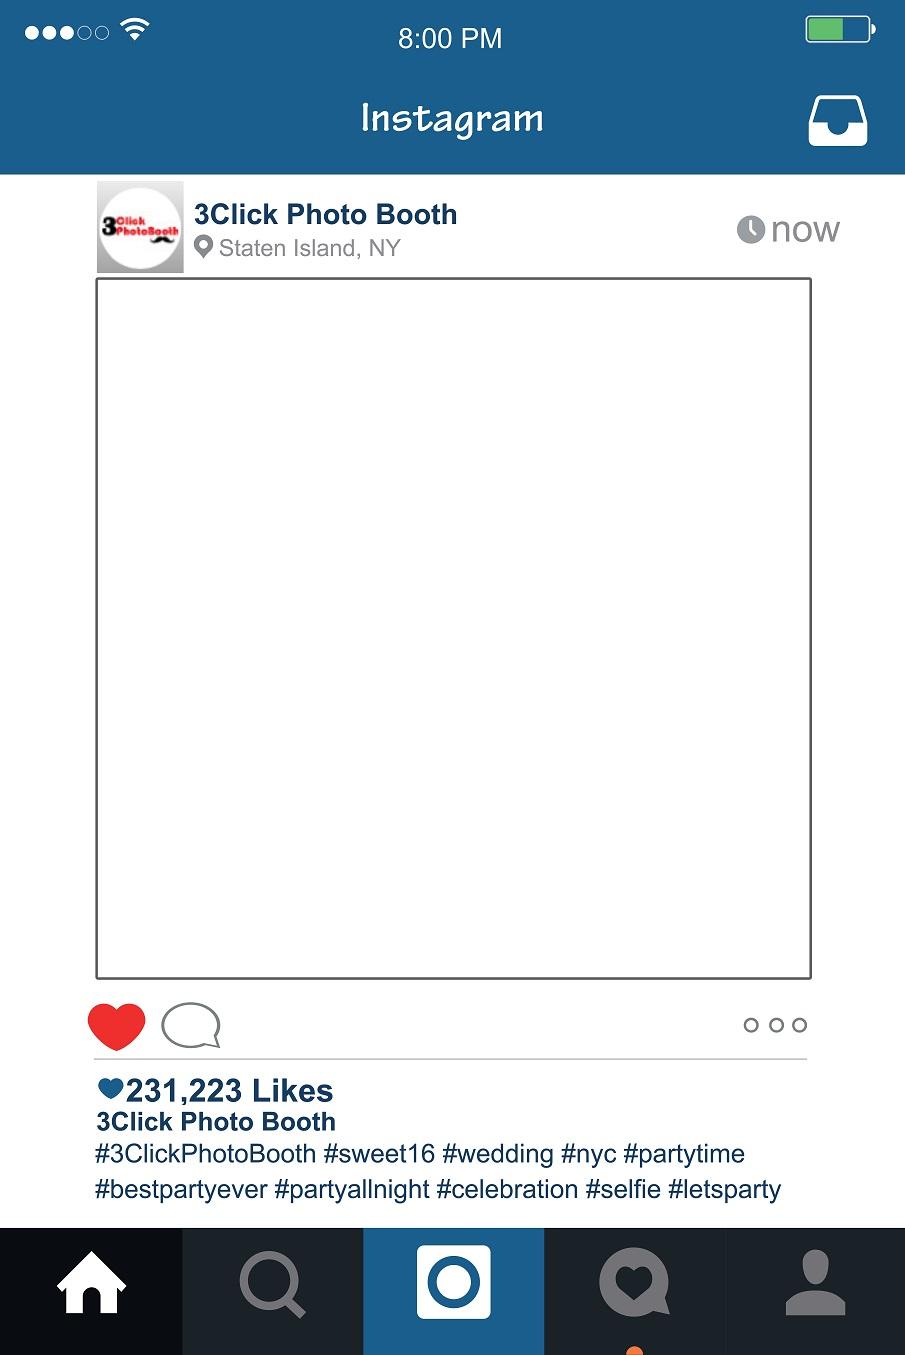 Instagram Photo Booth Instagram Frame Prop